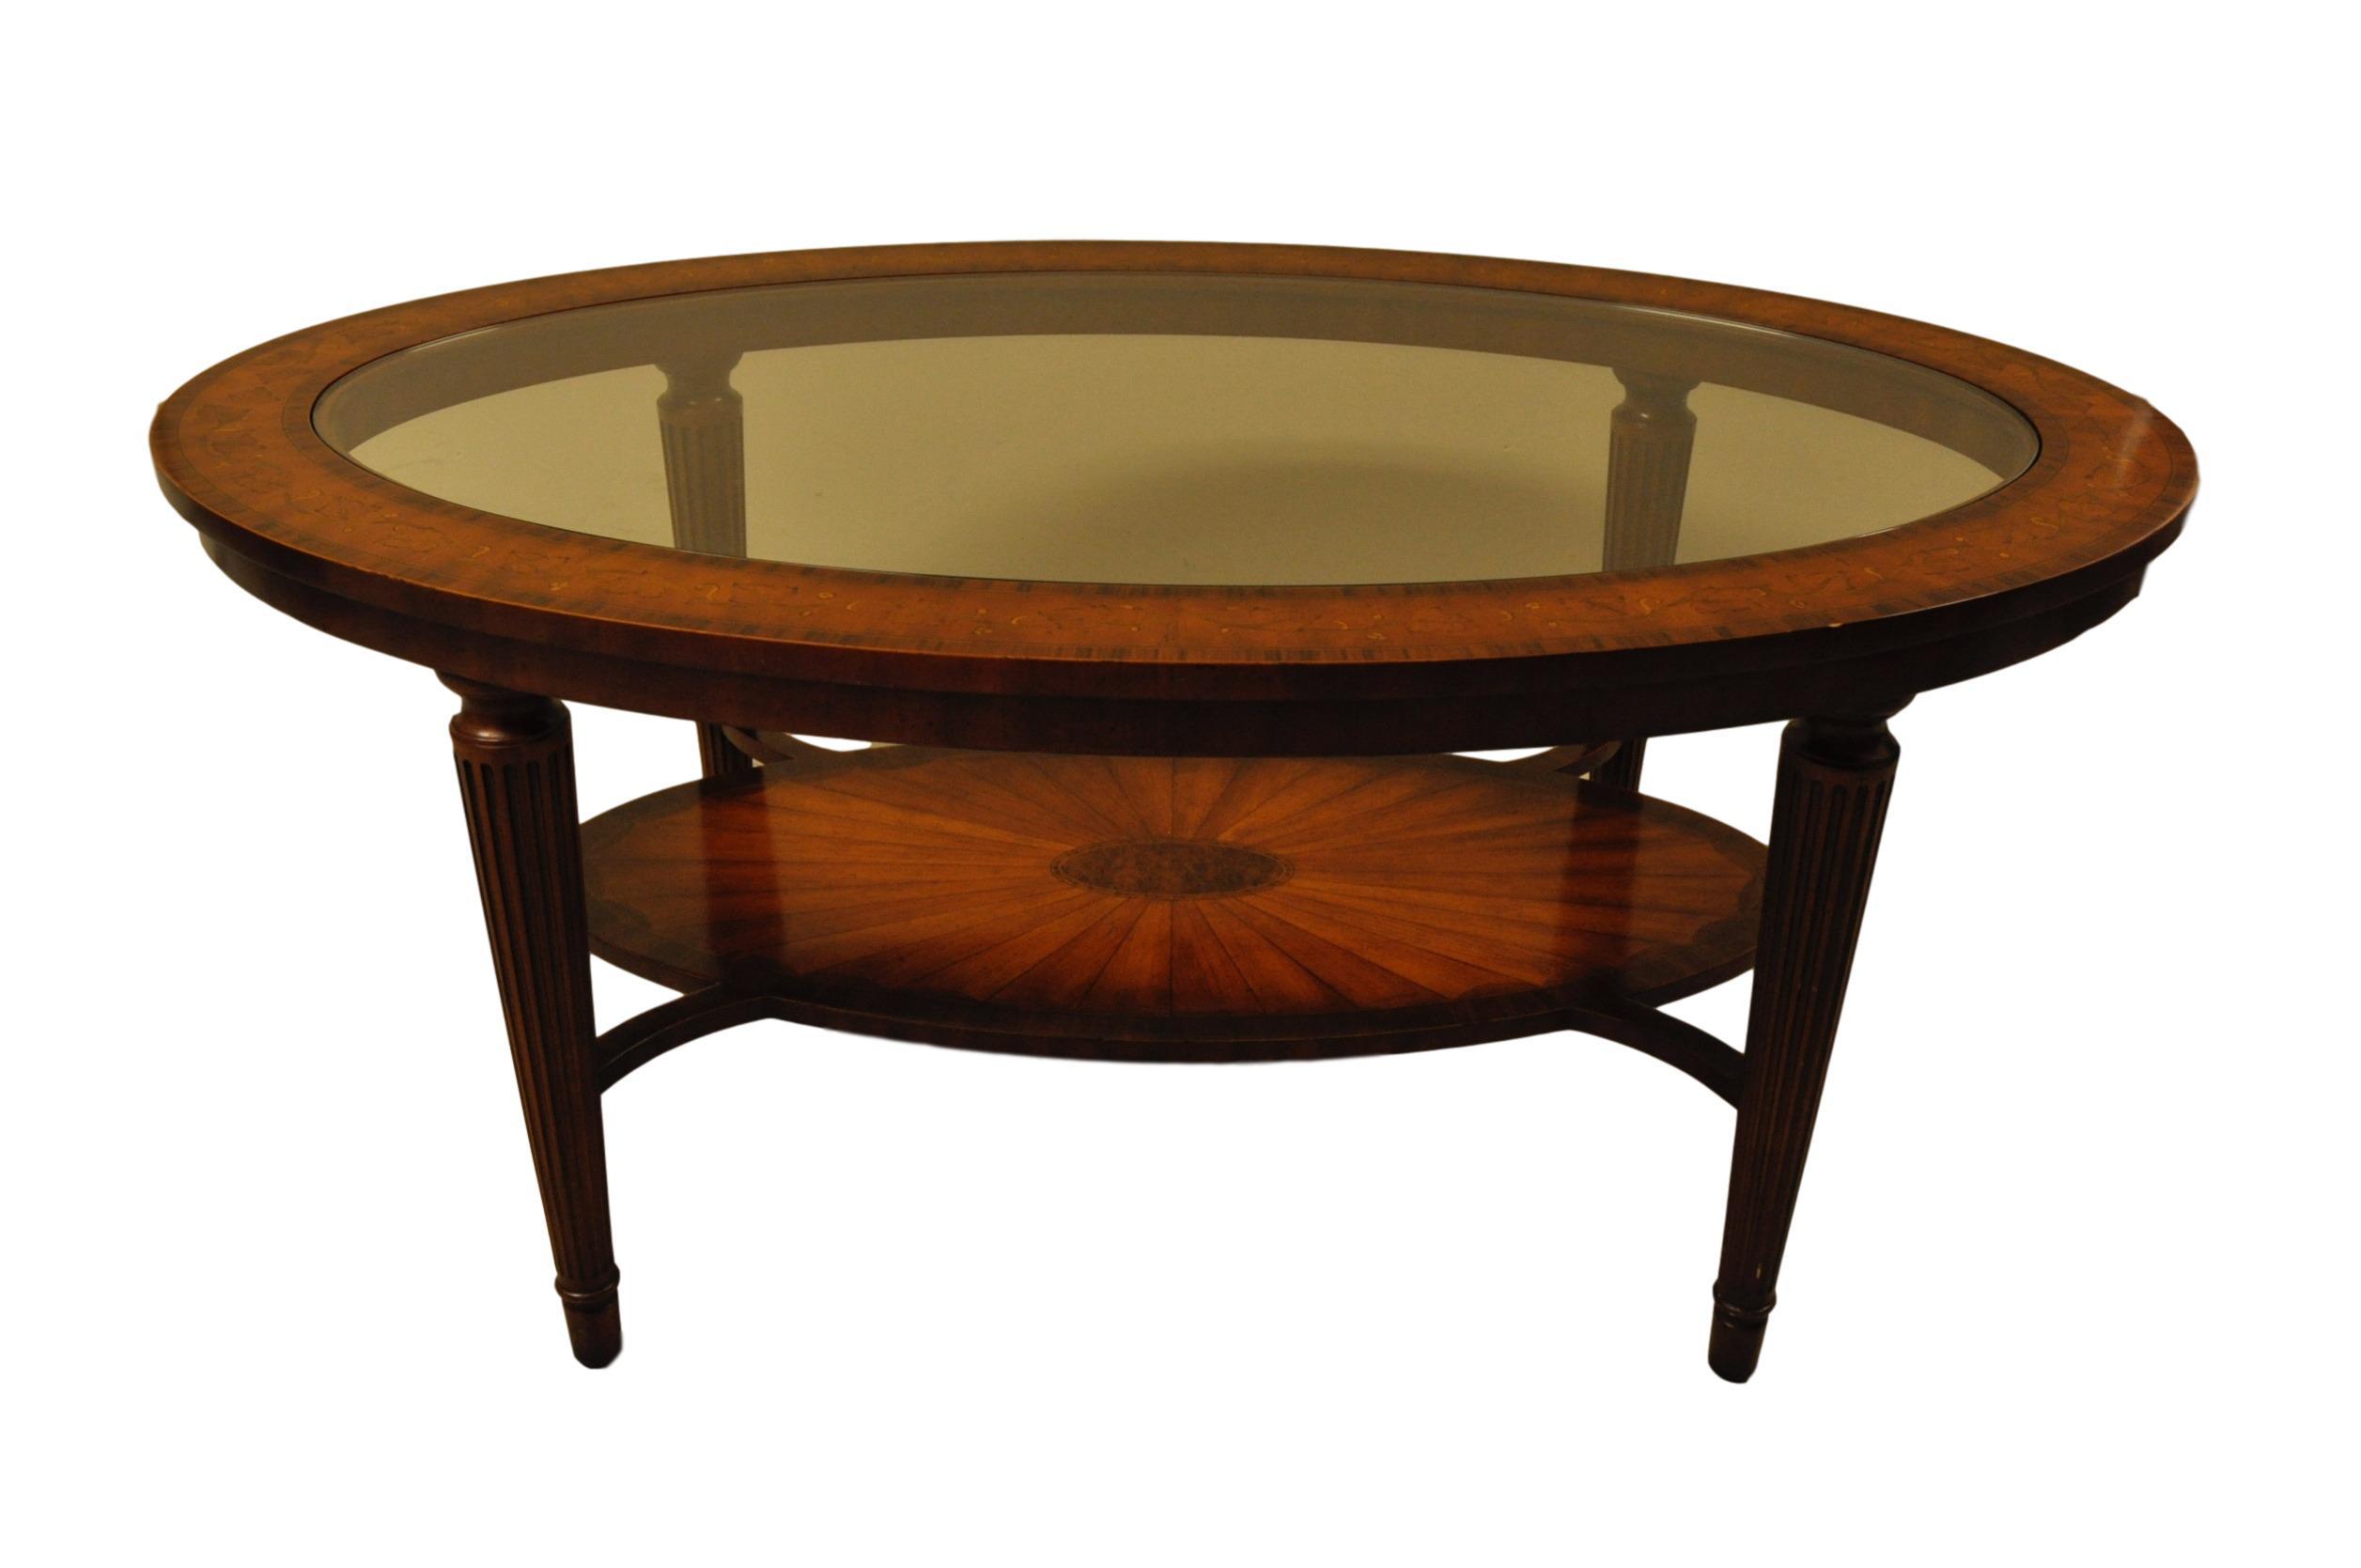 Maitland smith glass mahogany coffee table chairish for Table 52 art smith